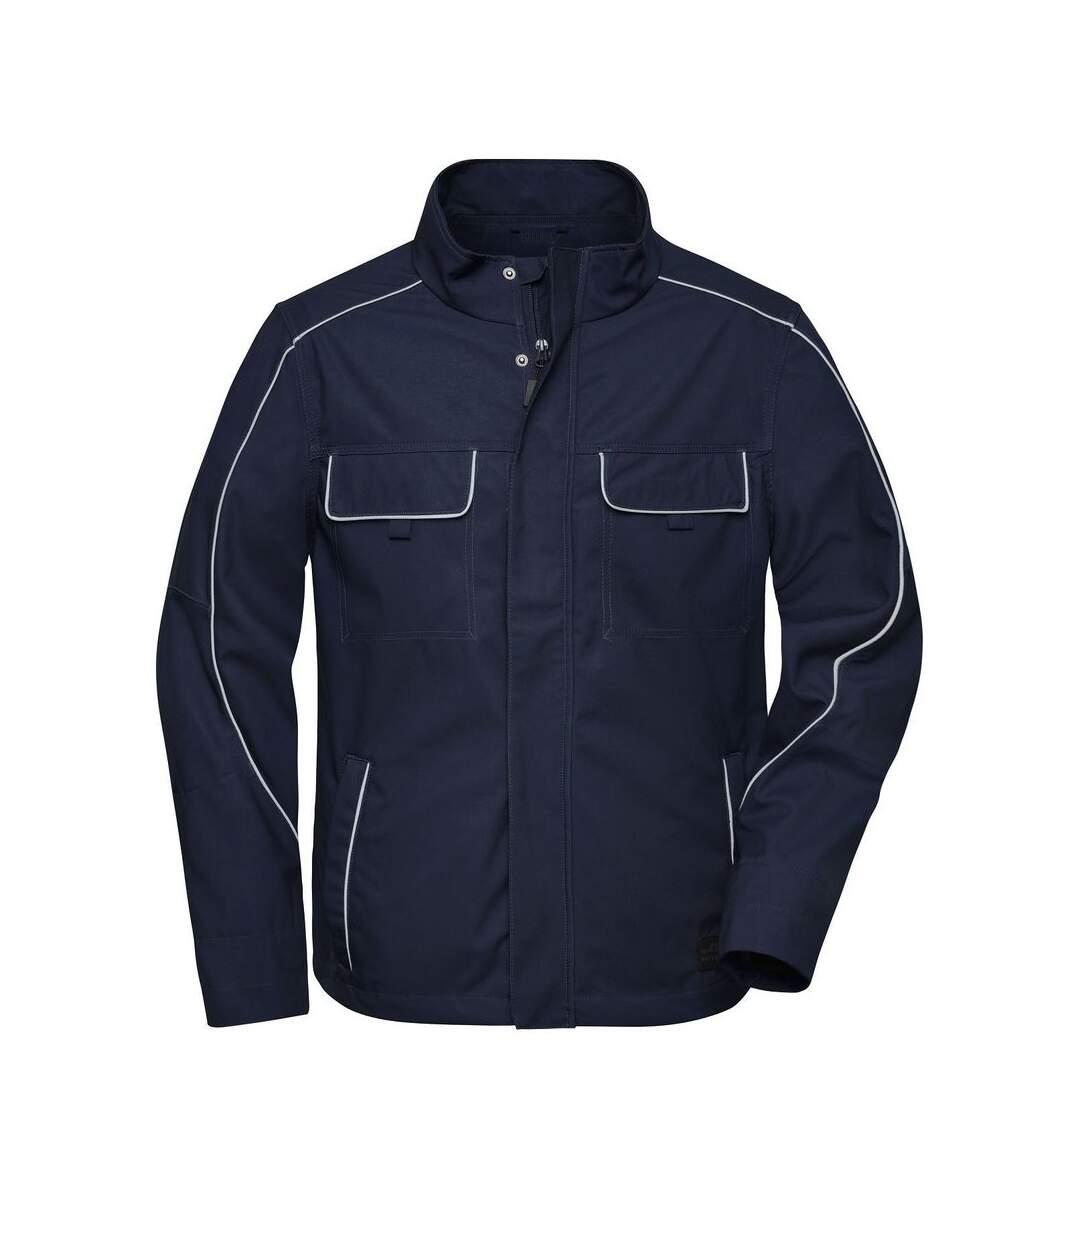 Veste de travail légere softshell - JN882 - bleu marine